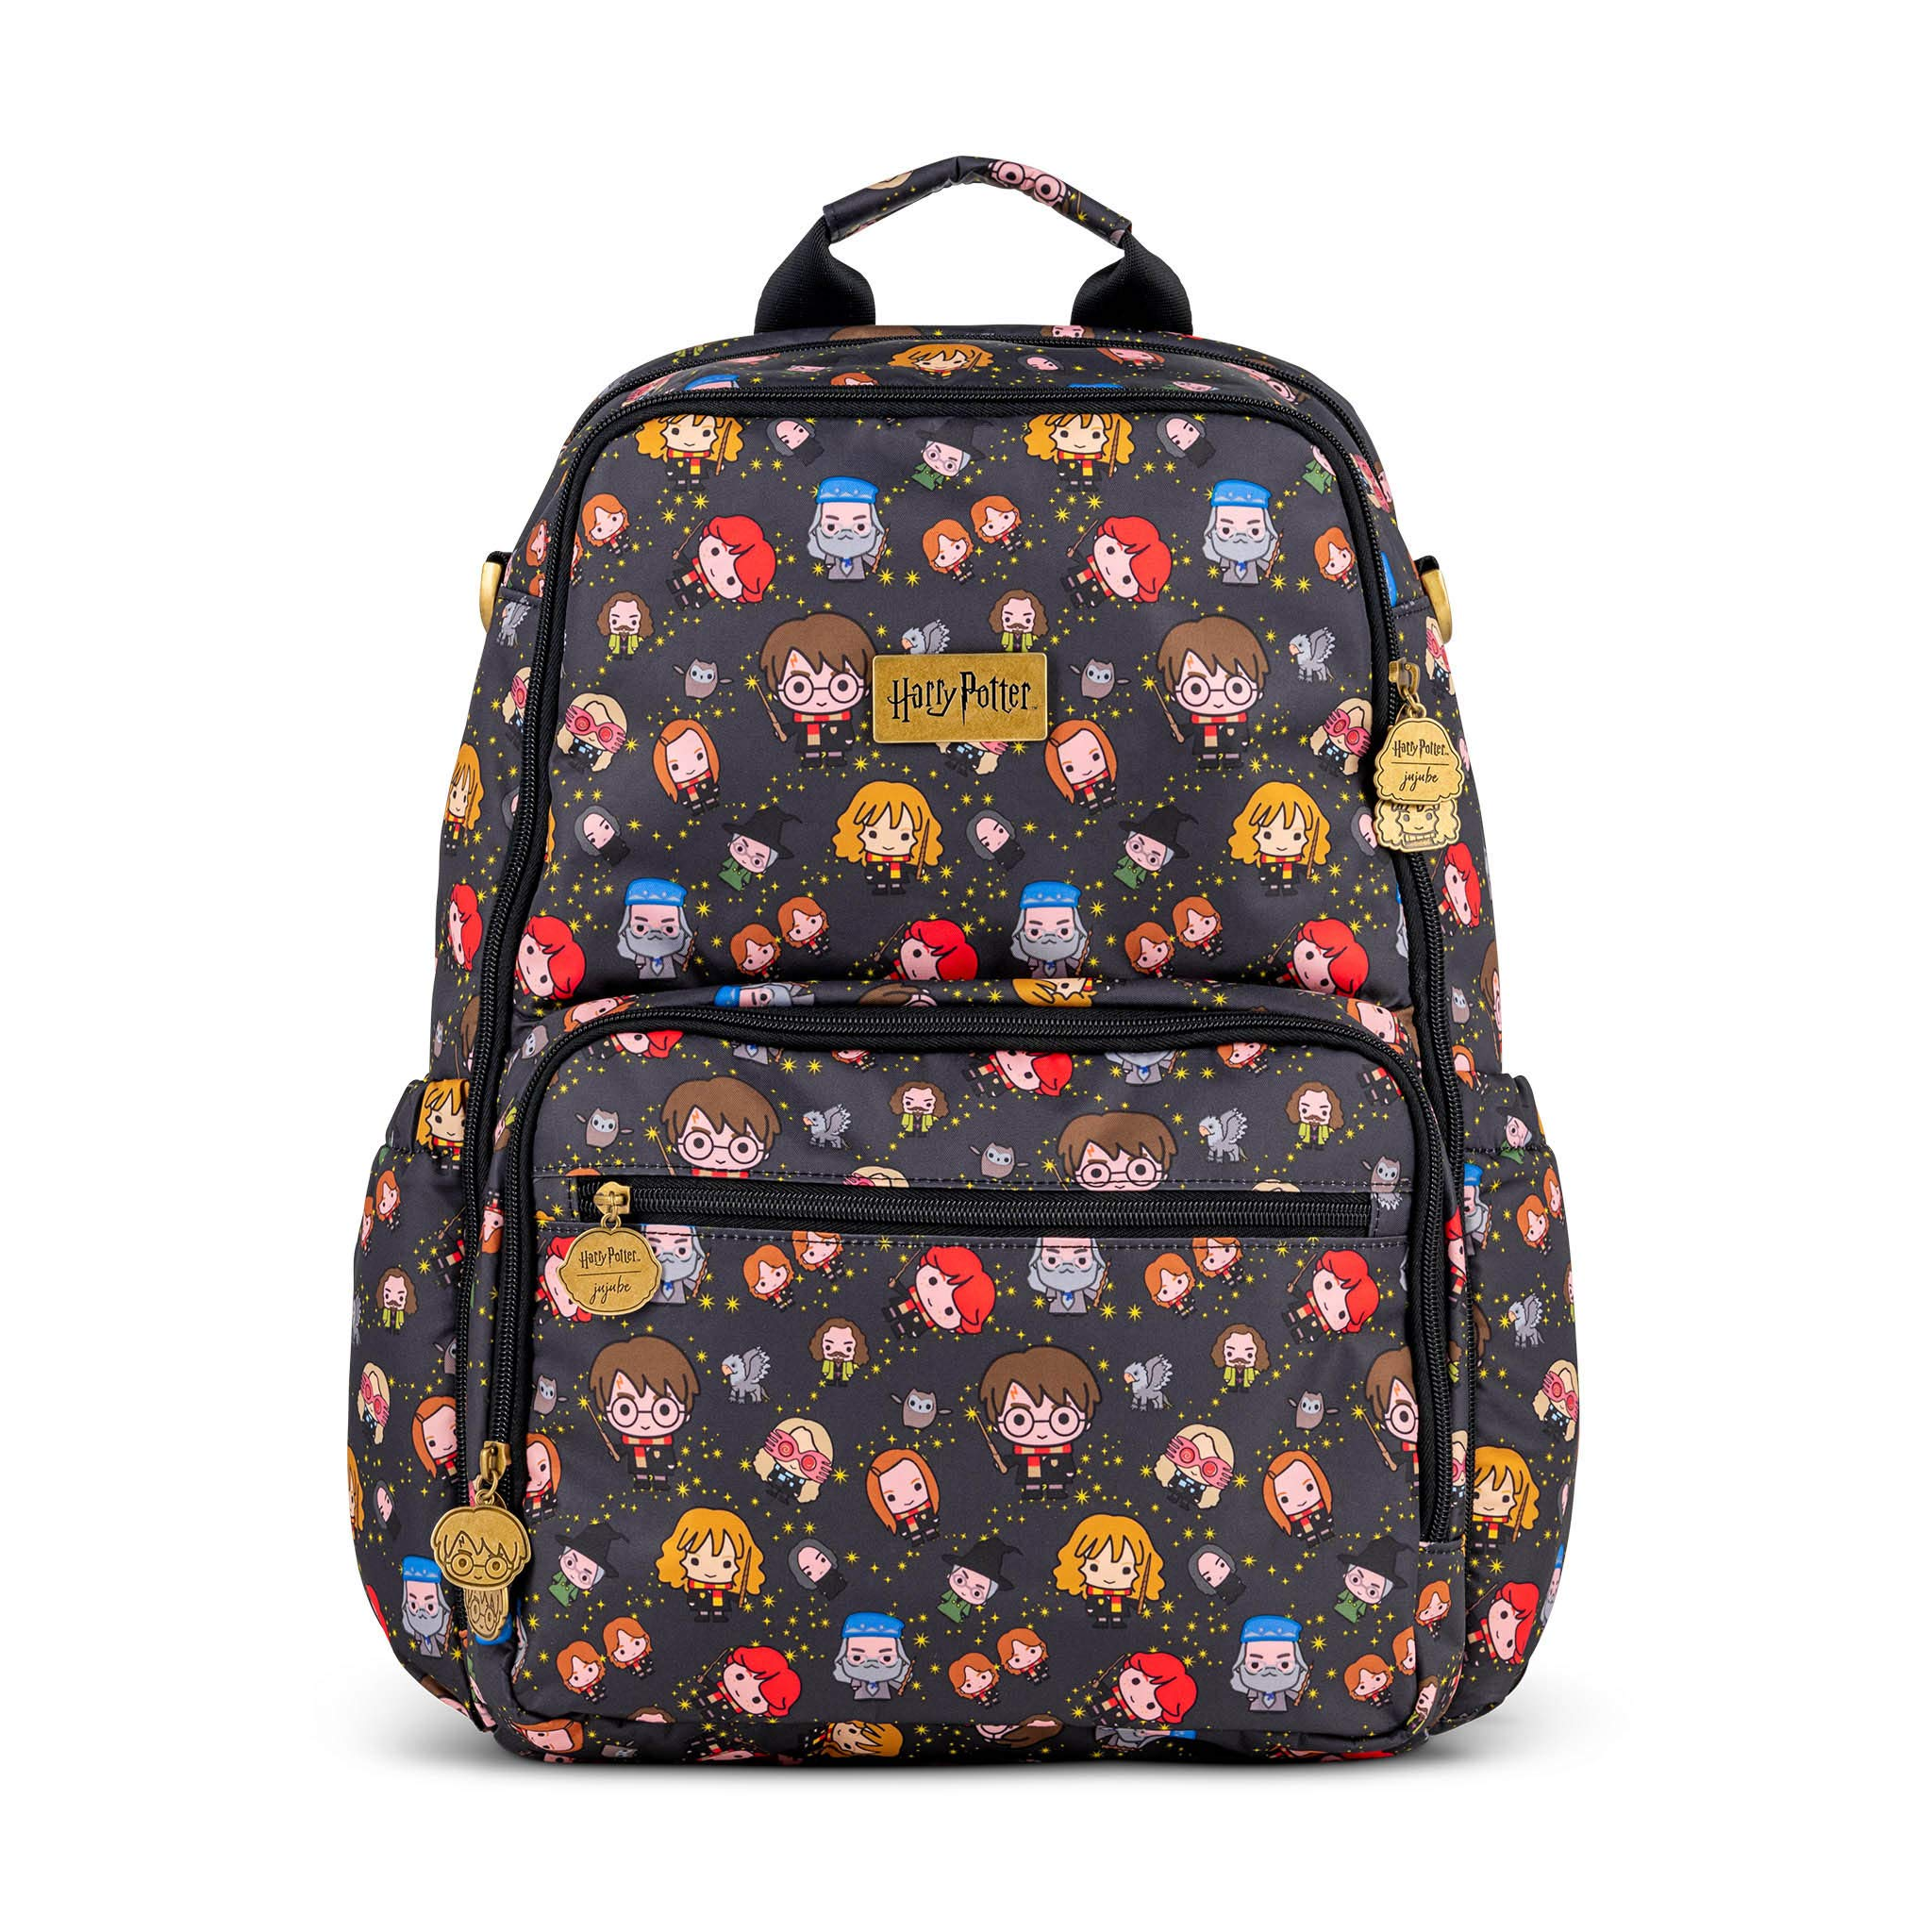 JuJuJuBe x 哈利波特新西兰背包  轻质、方便旅行、时尚尿布袋、儿童及成人多功能背包钱包、休闲小背包  包括尿布更换垫 快干挂件